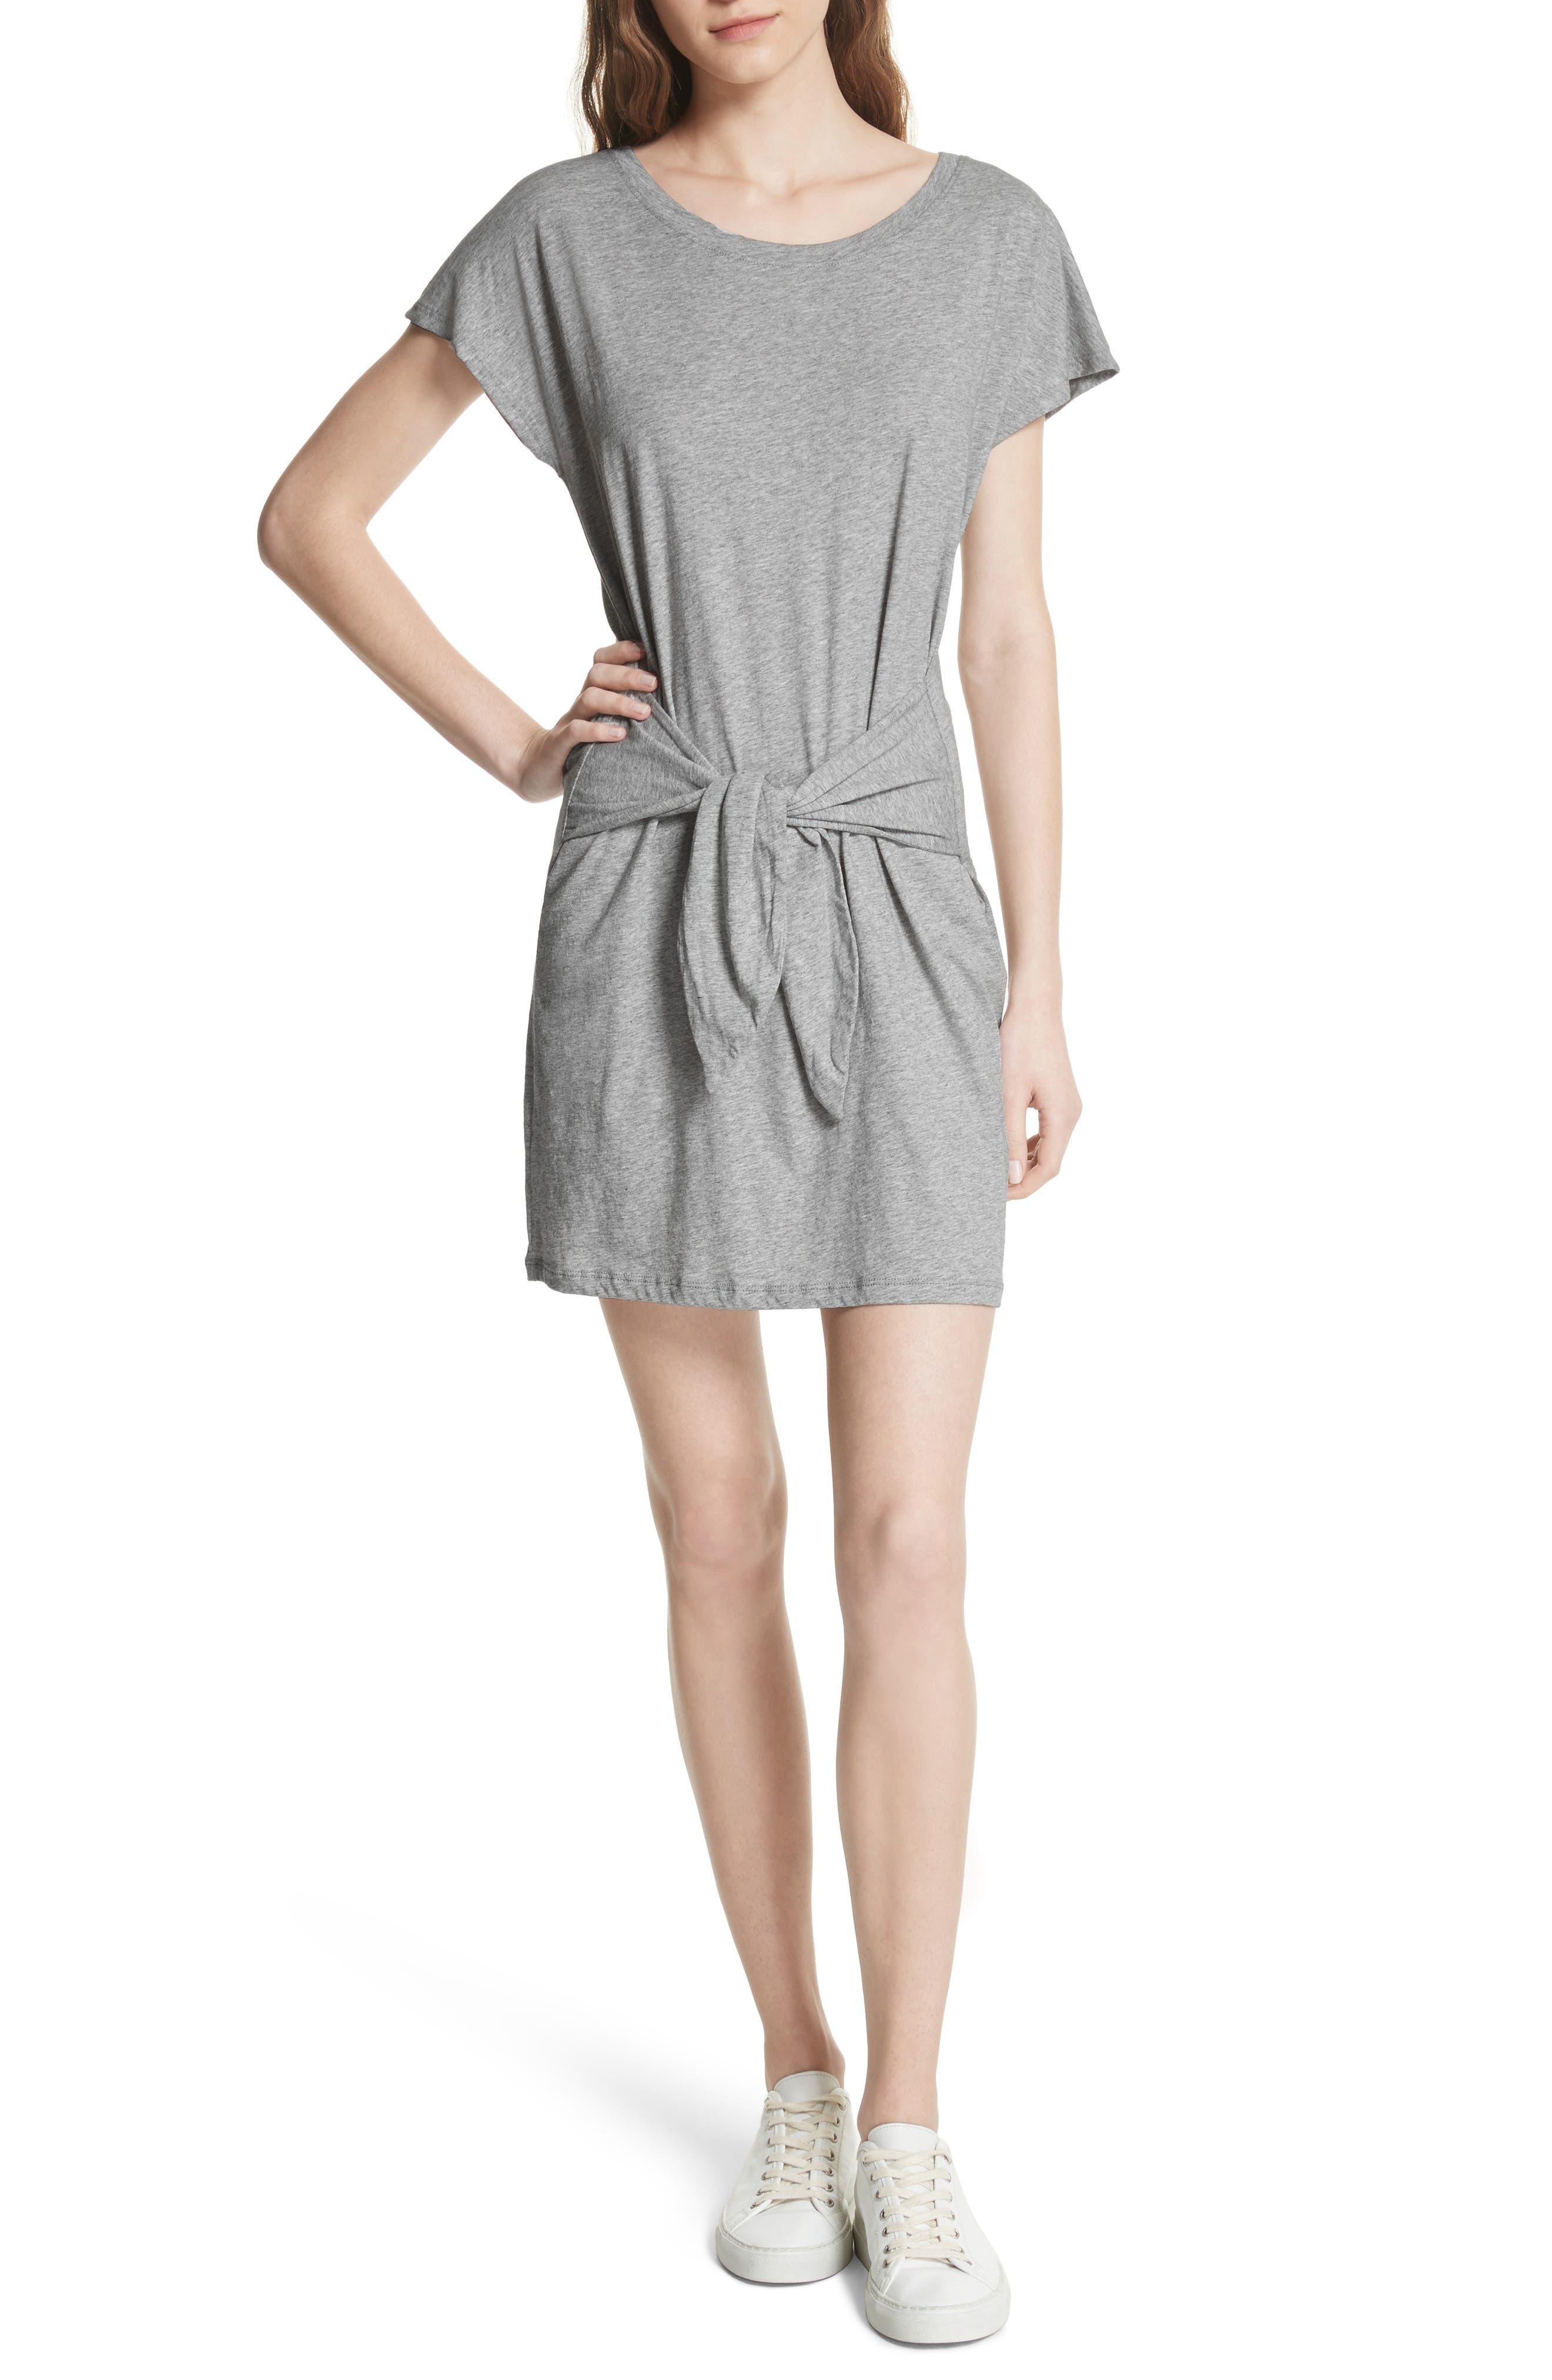 Alyra Tie Waist Cotton T-Shirt Dress,                         Main,                         color, 030